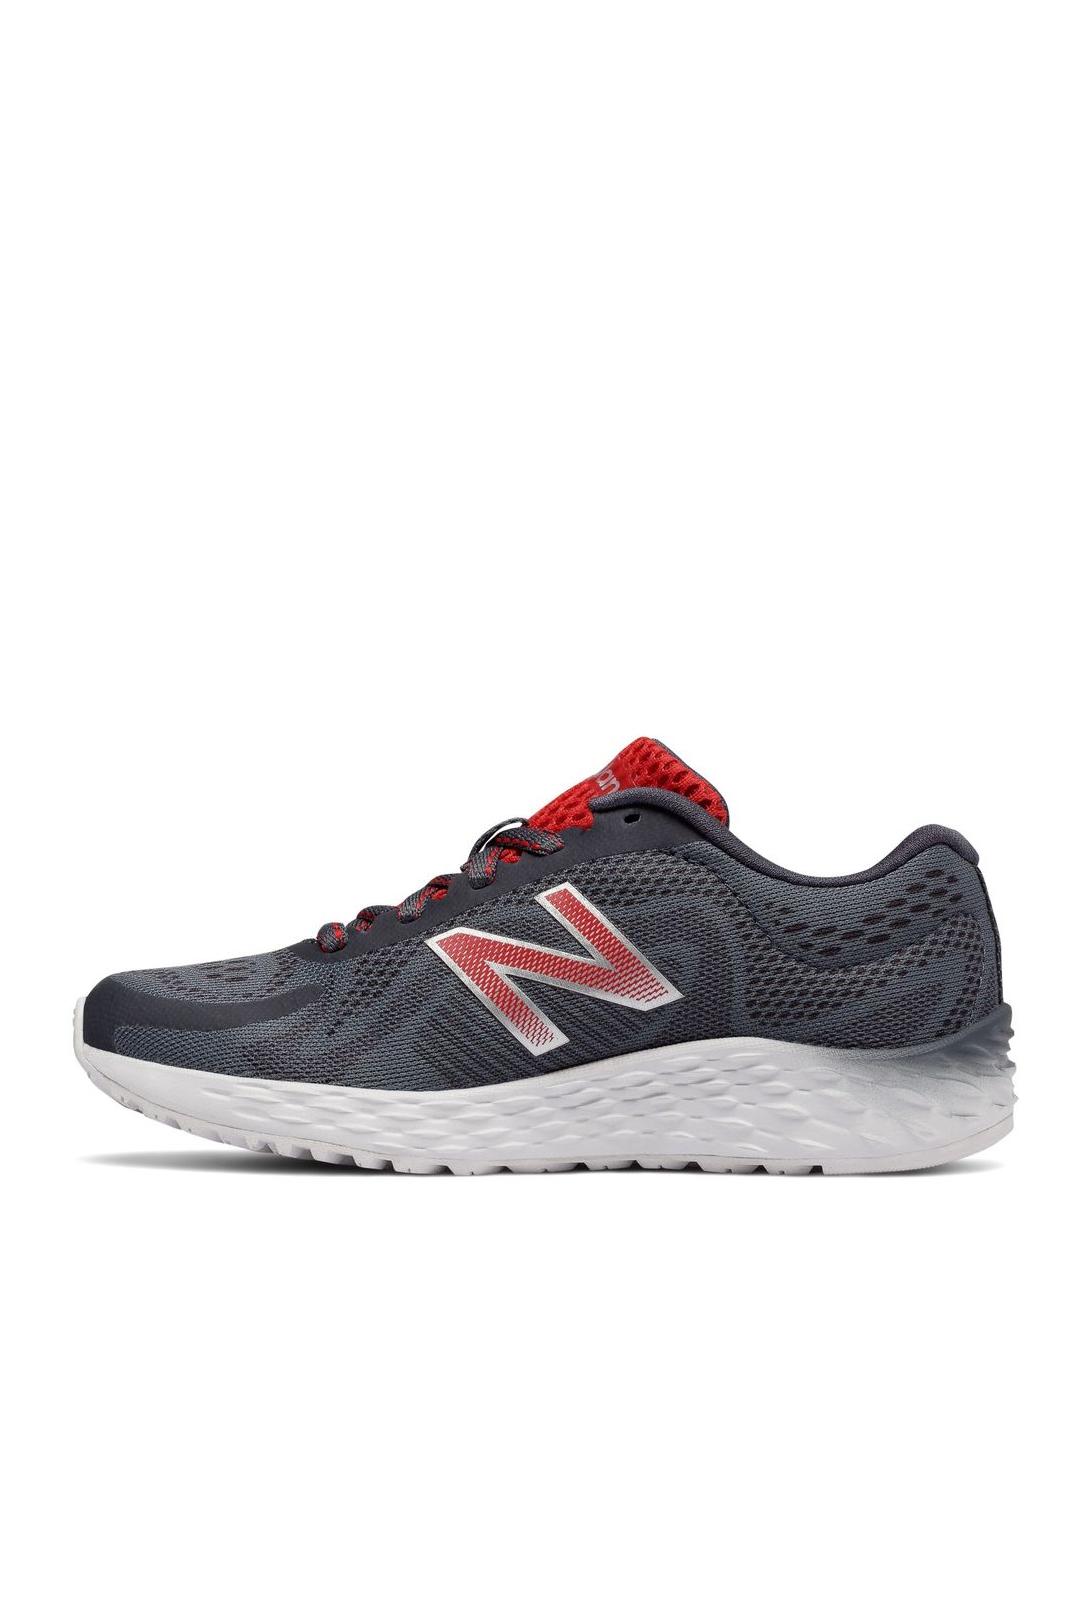 Baskets / Sneakers  New balance KJARITPY gris